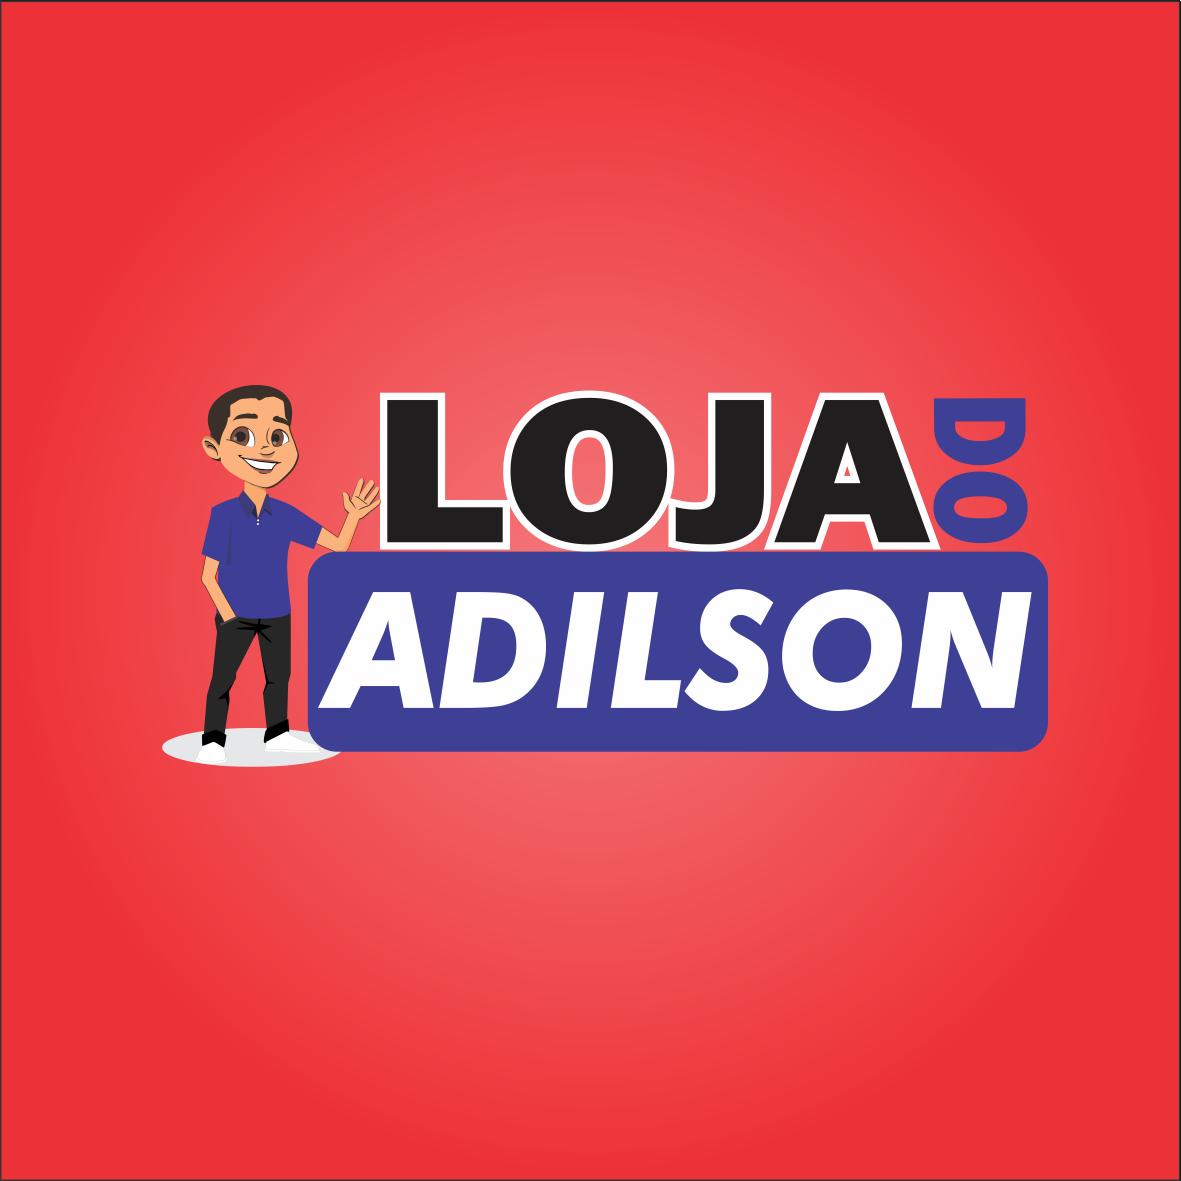 Loja do Adilson logo